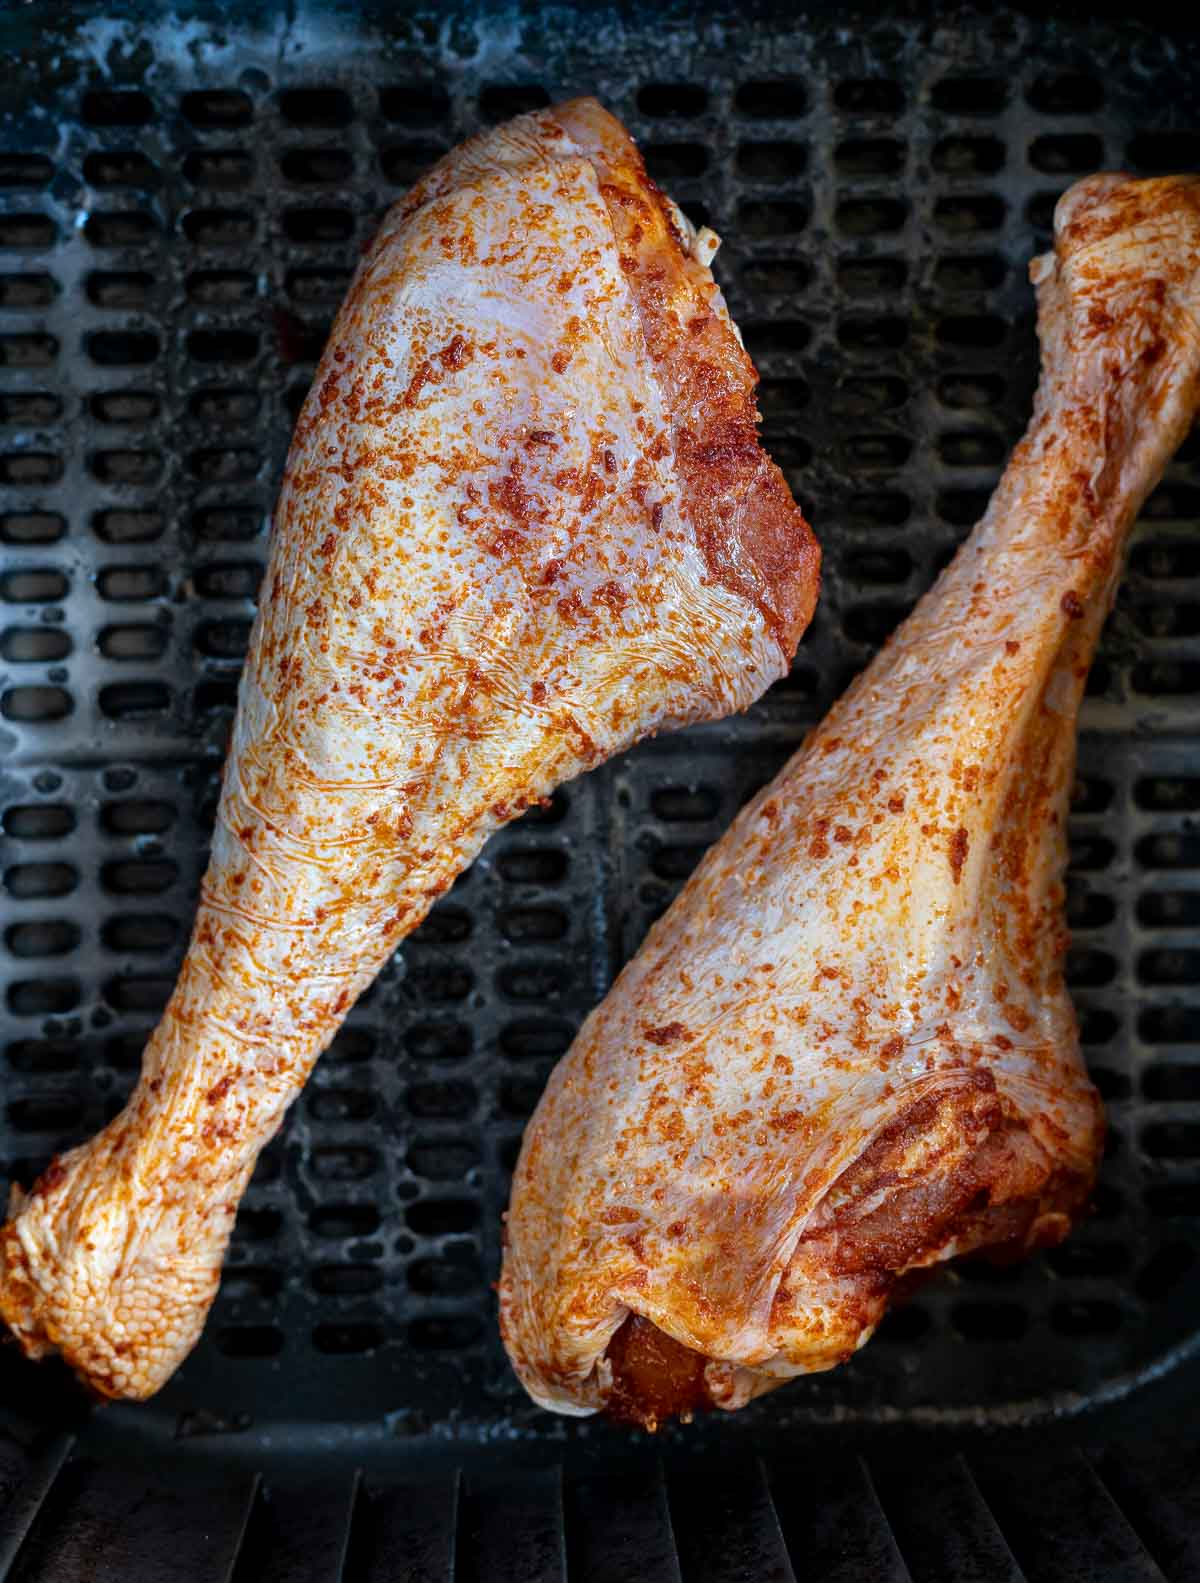 raw turkey legs in air fryer basket